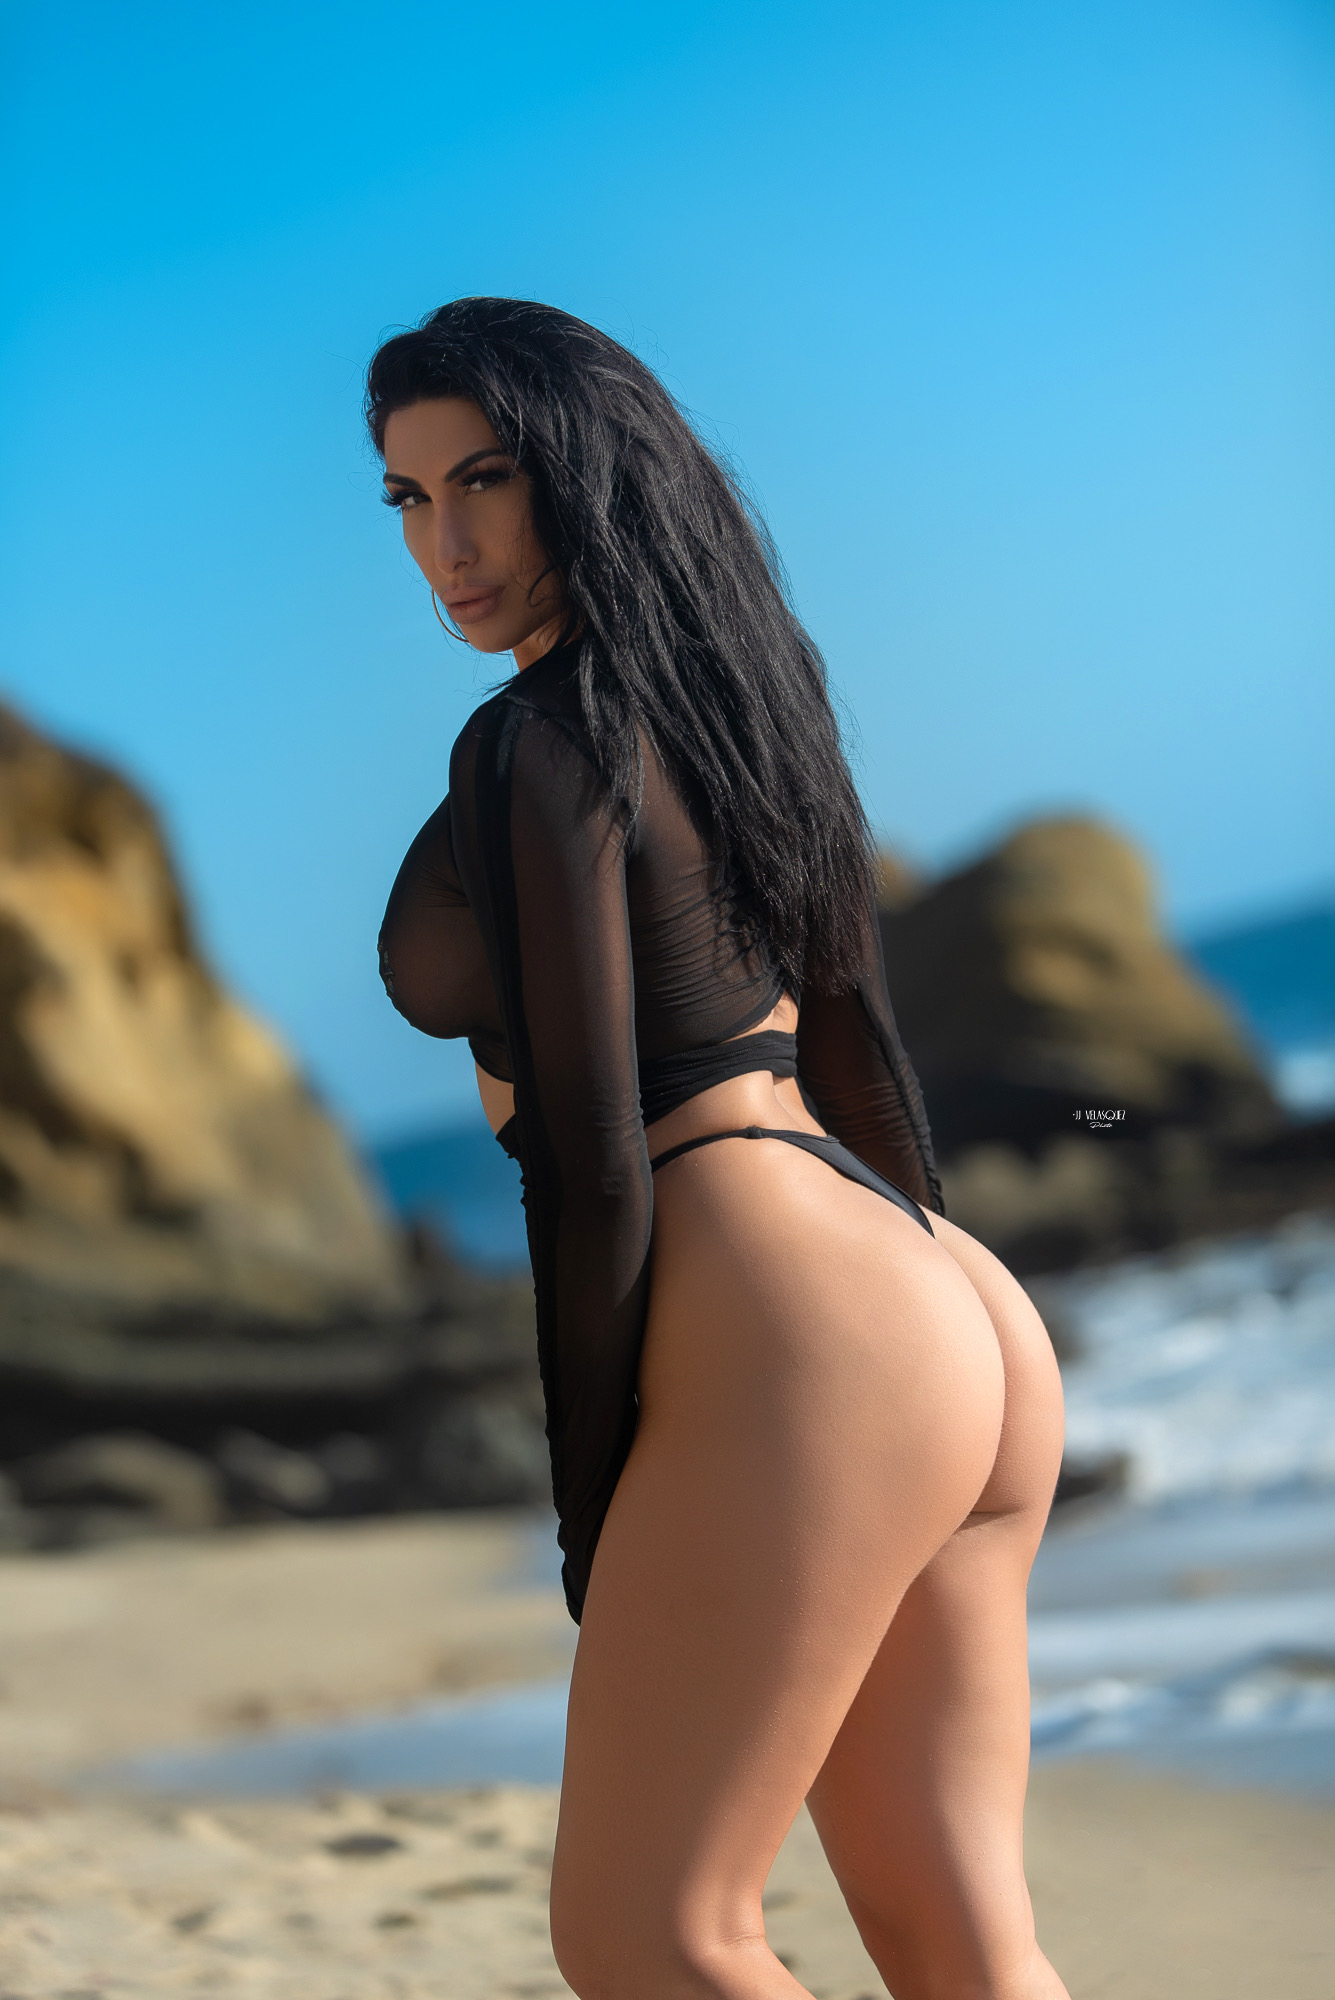 Zhara Sexiest Female Exotic Dancer in Riverside/Temecula, California